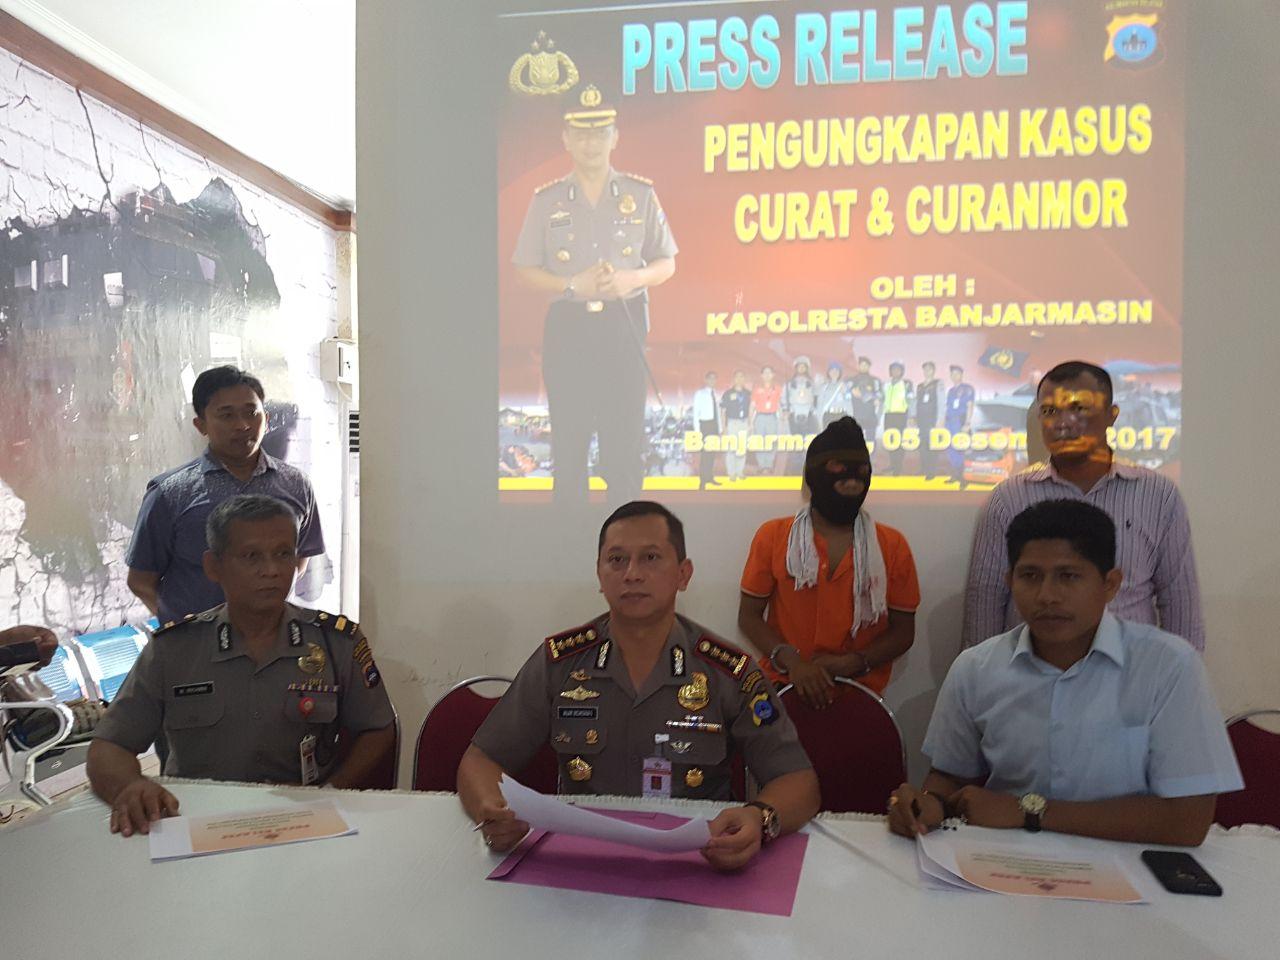 Press Release : Bermodal Nekad, Pemain Tunggal Kasus Pencurian Gasak 10 Unit Kendaraan Bermotor